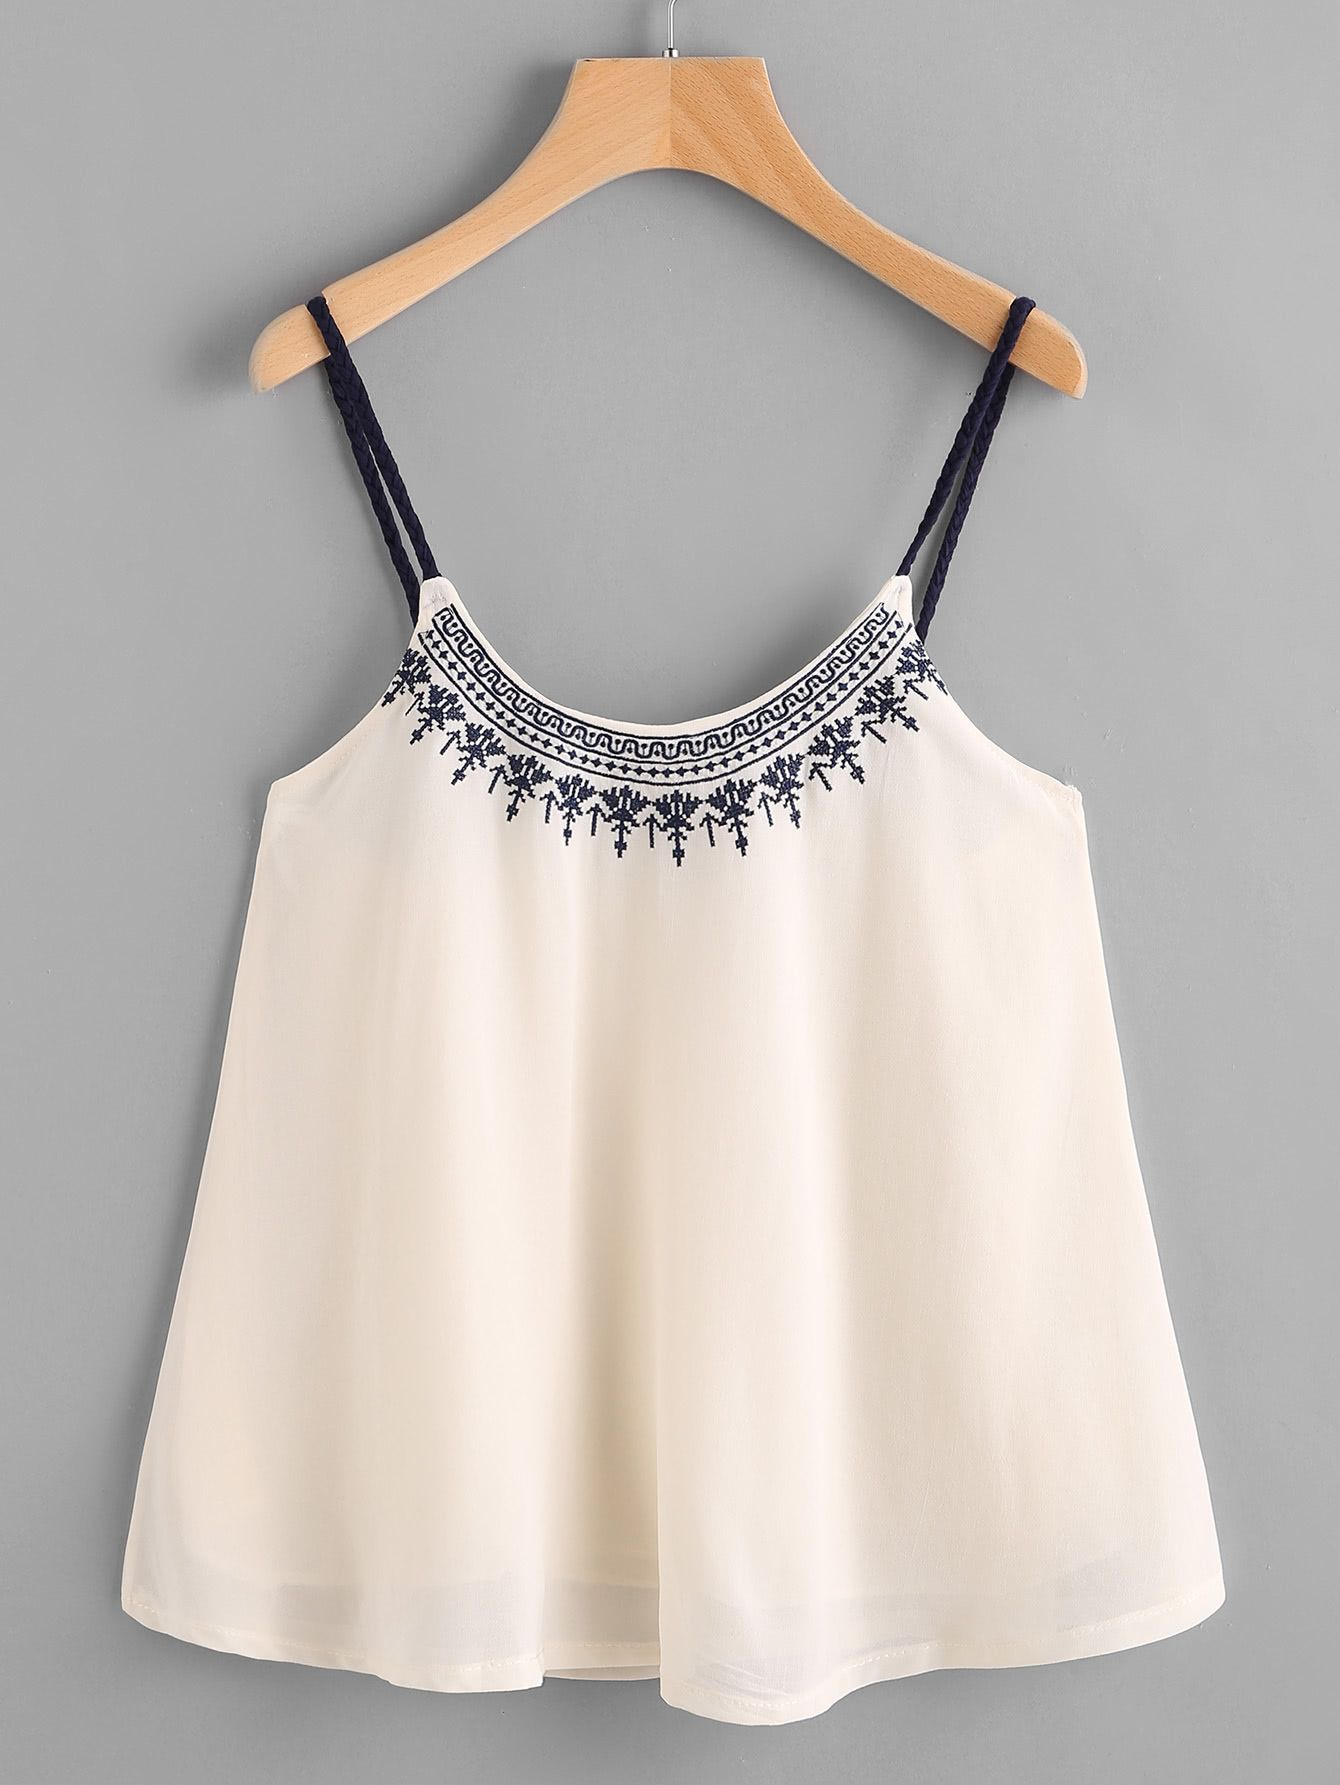 Womens new Halter Neck Tie Back Crop Top Ladies Sleeveless Cami Fancy Strap Blou